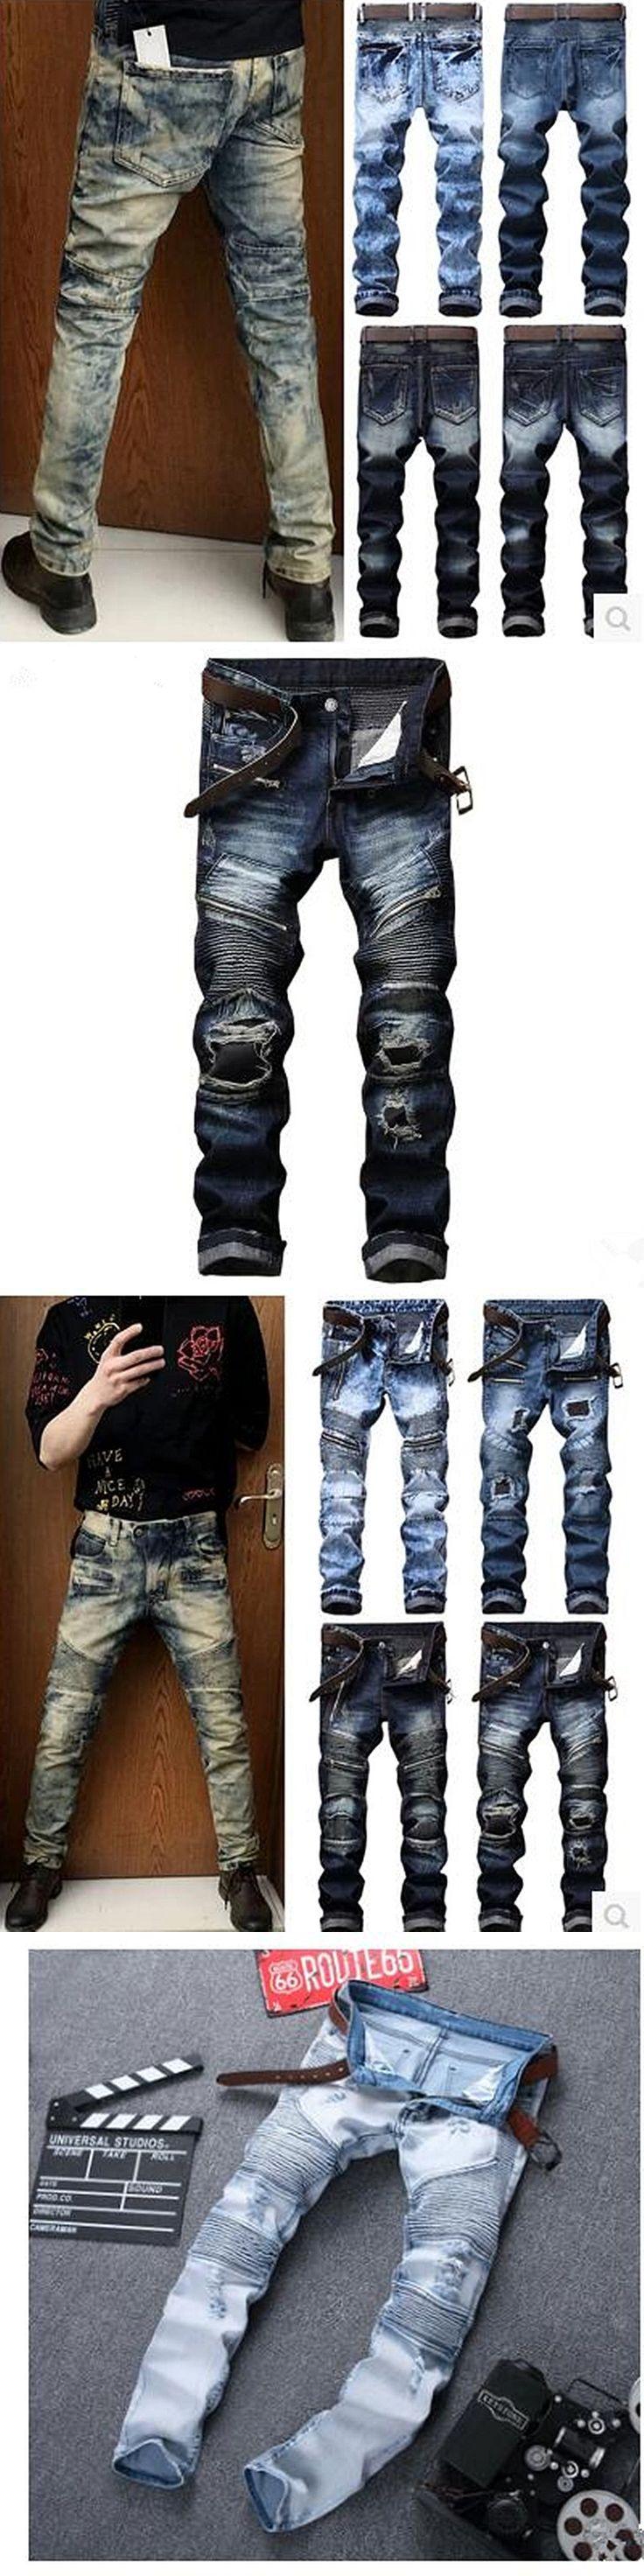 Men Jeans Brand Frayed Destroyed Slim Retro Cowboy Motorcycle Slacks Snowflake Spot Coating Pure Cotton Pants For Large Size